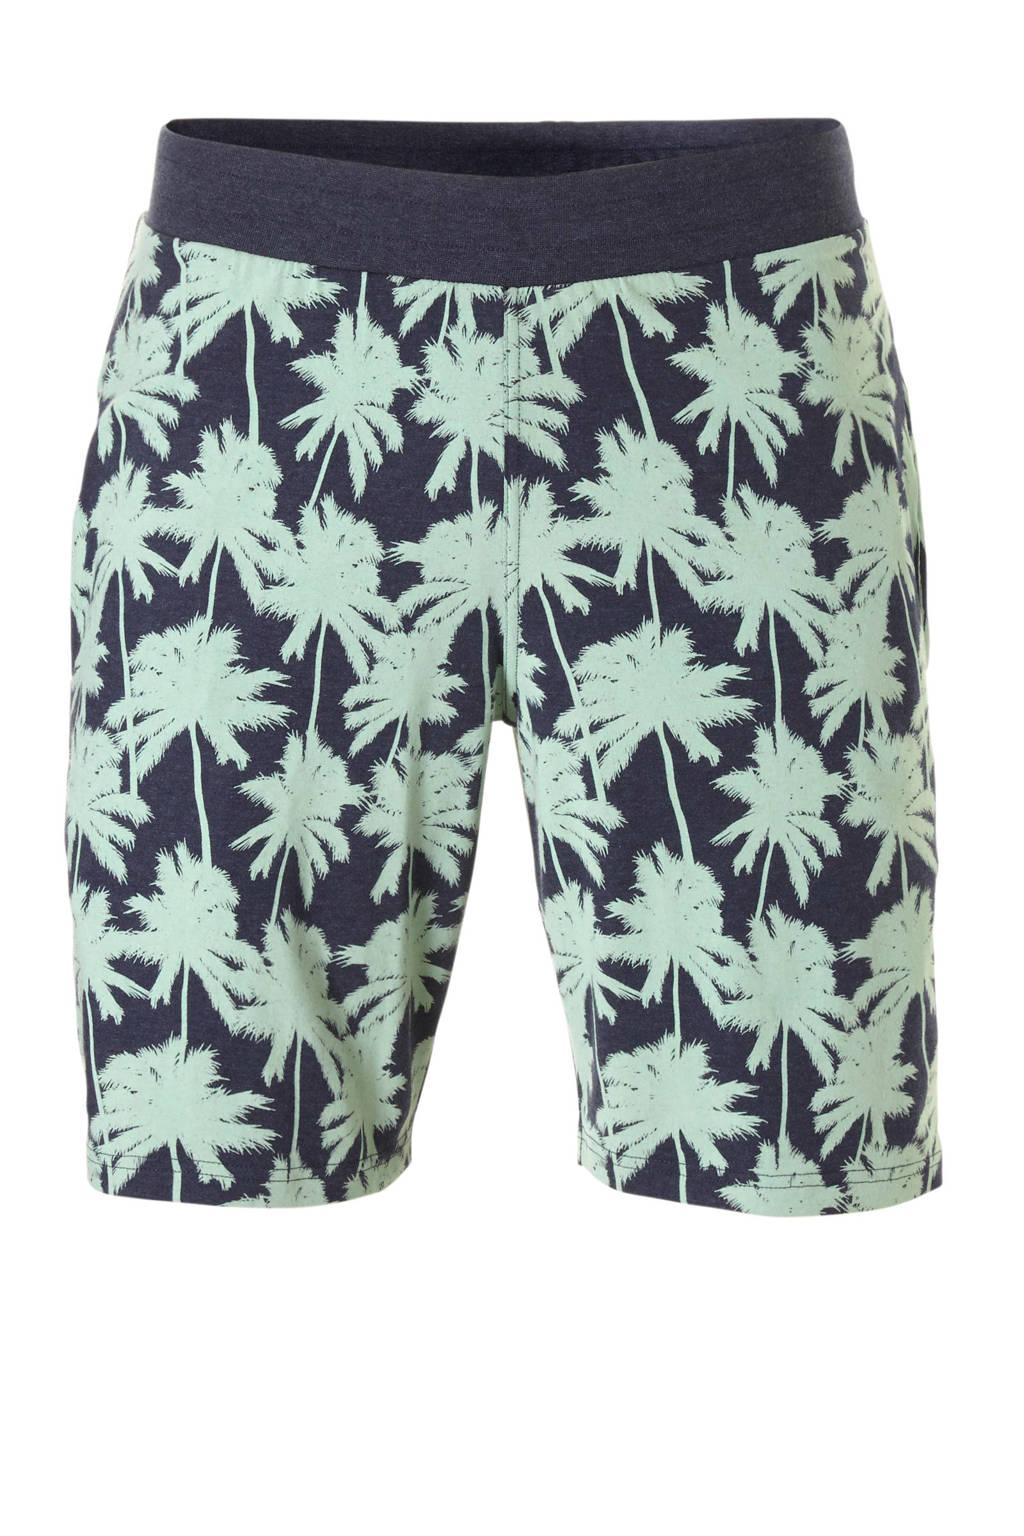 Charlie Choe pyjamashort met all over print groen, Blauw/groen